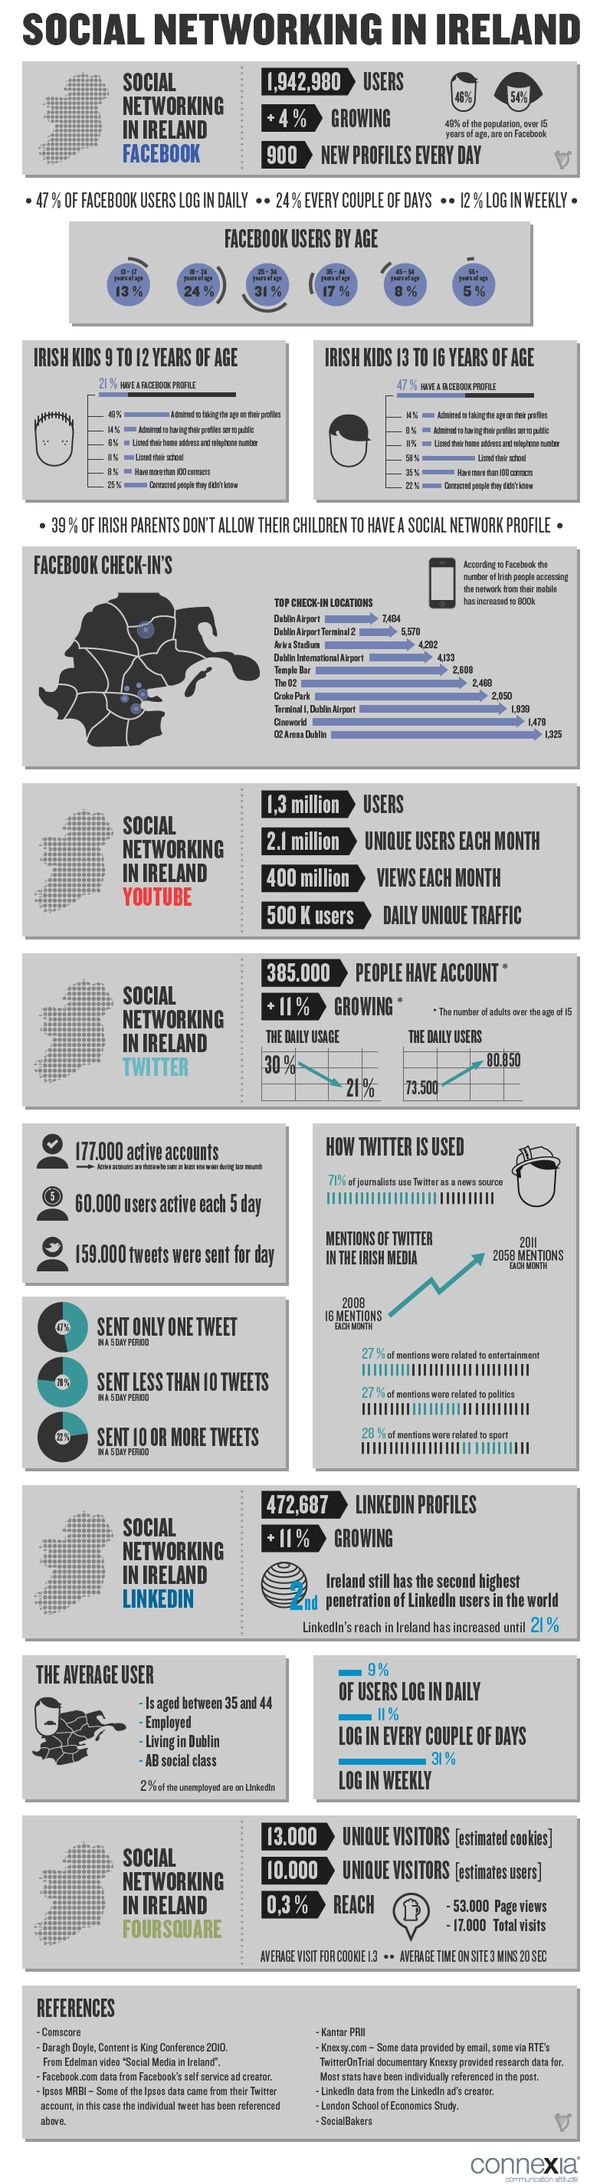 Social Networking in Ireland on Behance